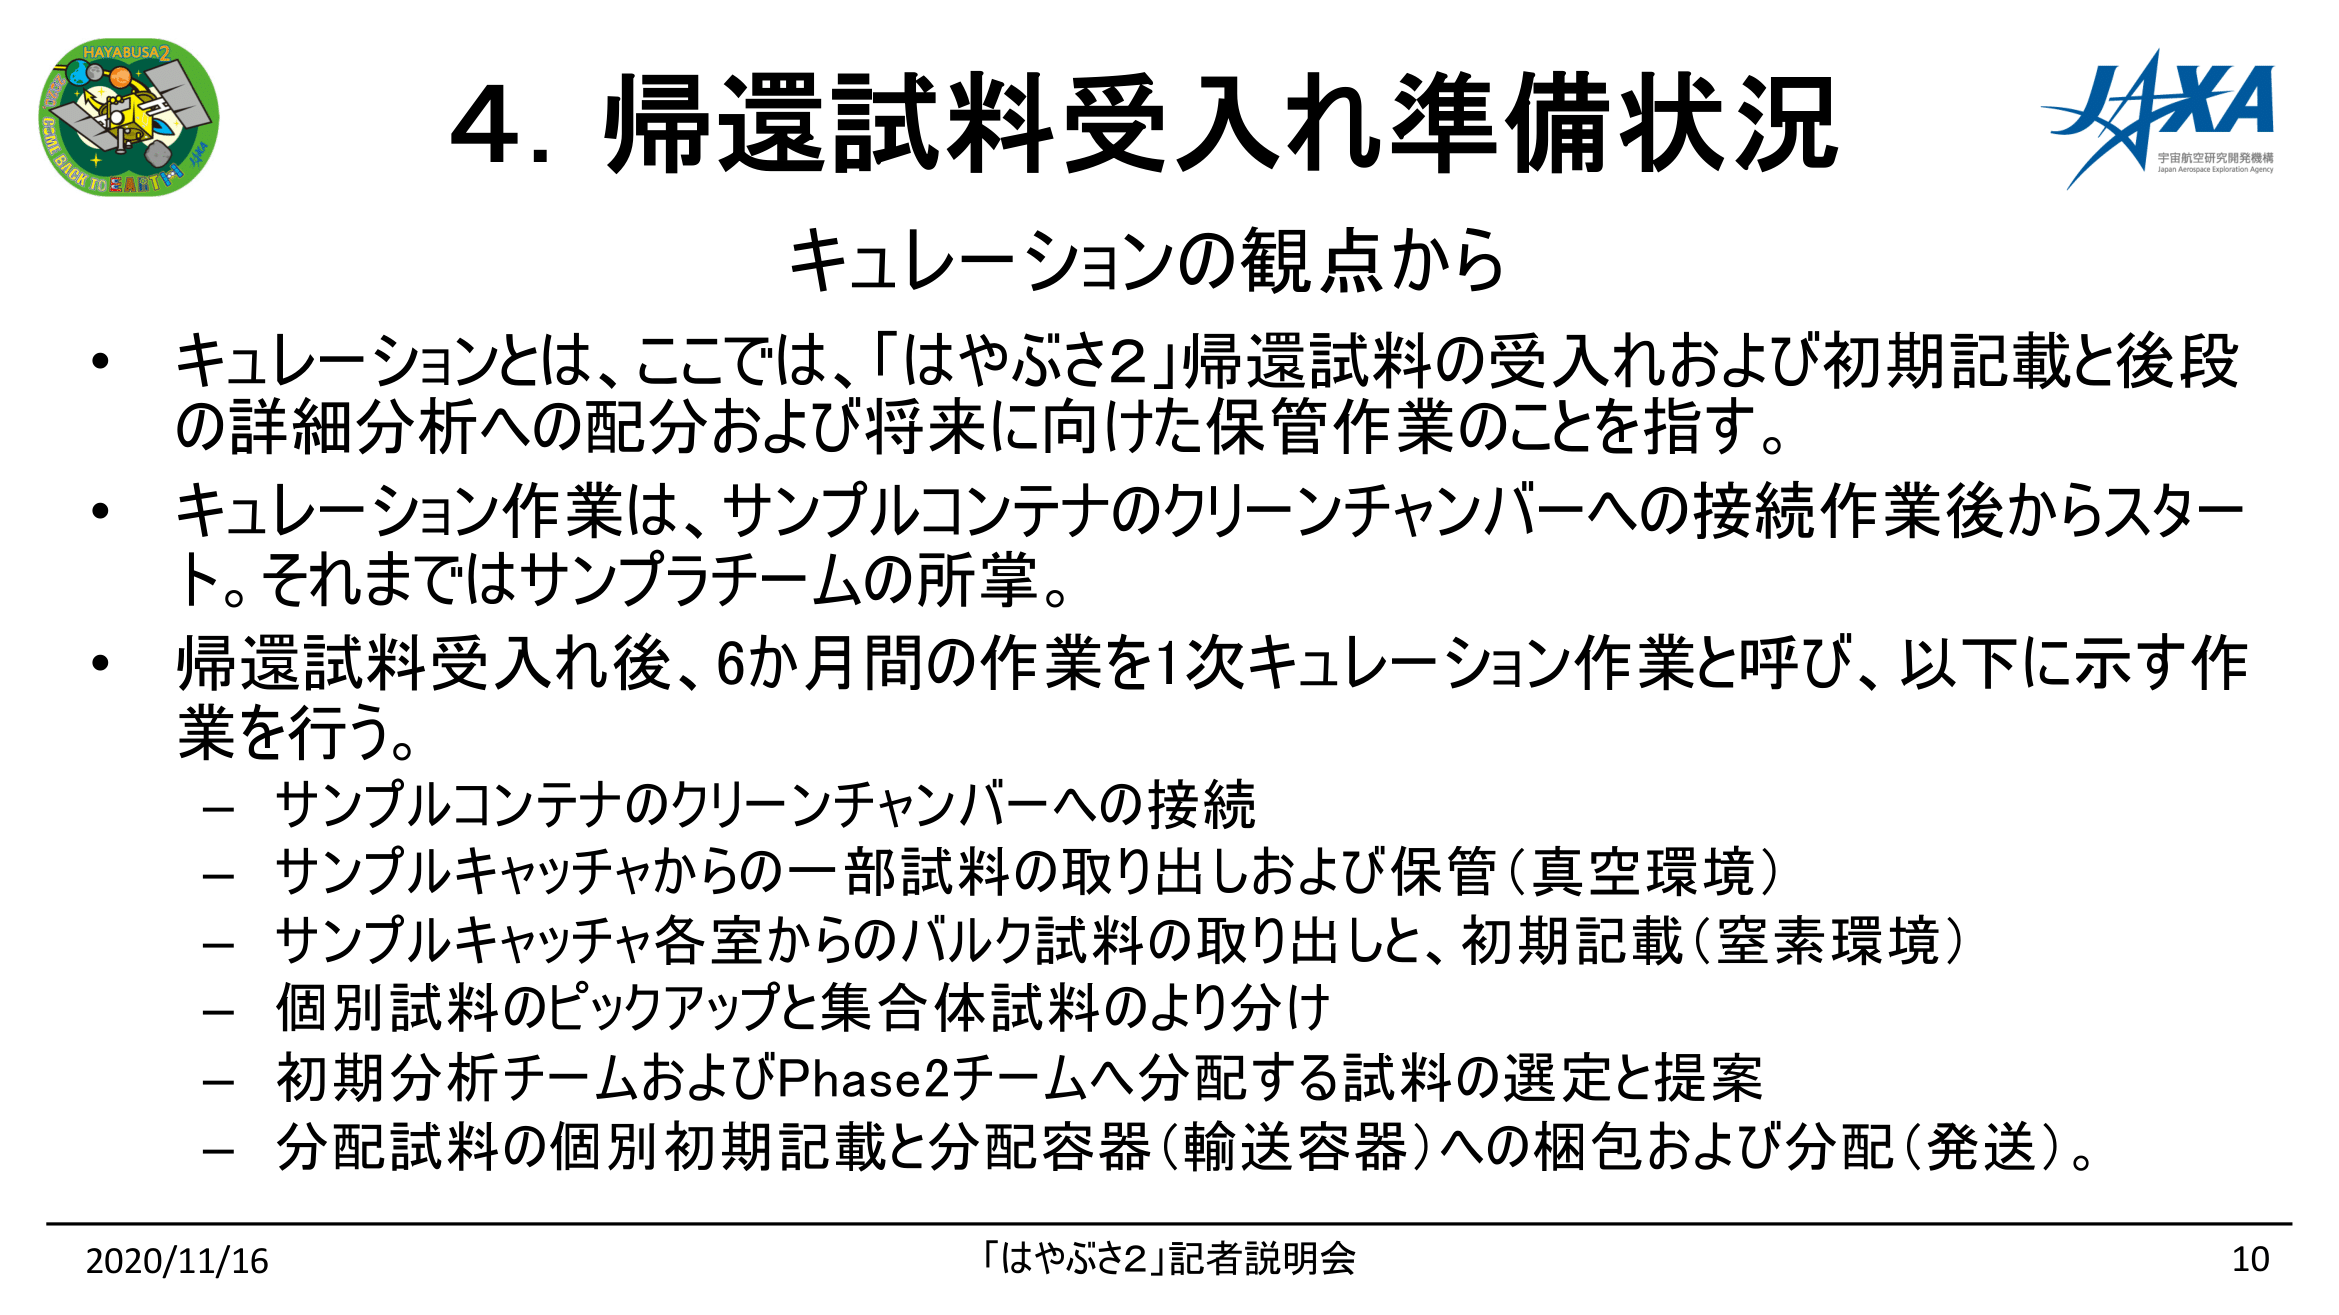 f:id:Imamura:20201116151210p:plain